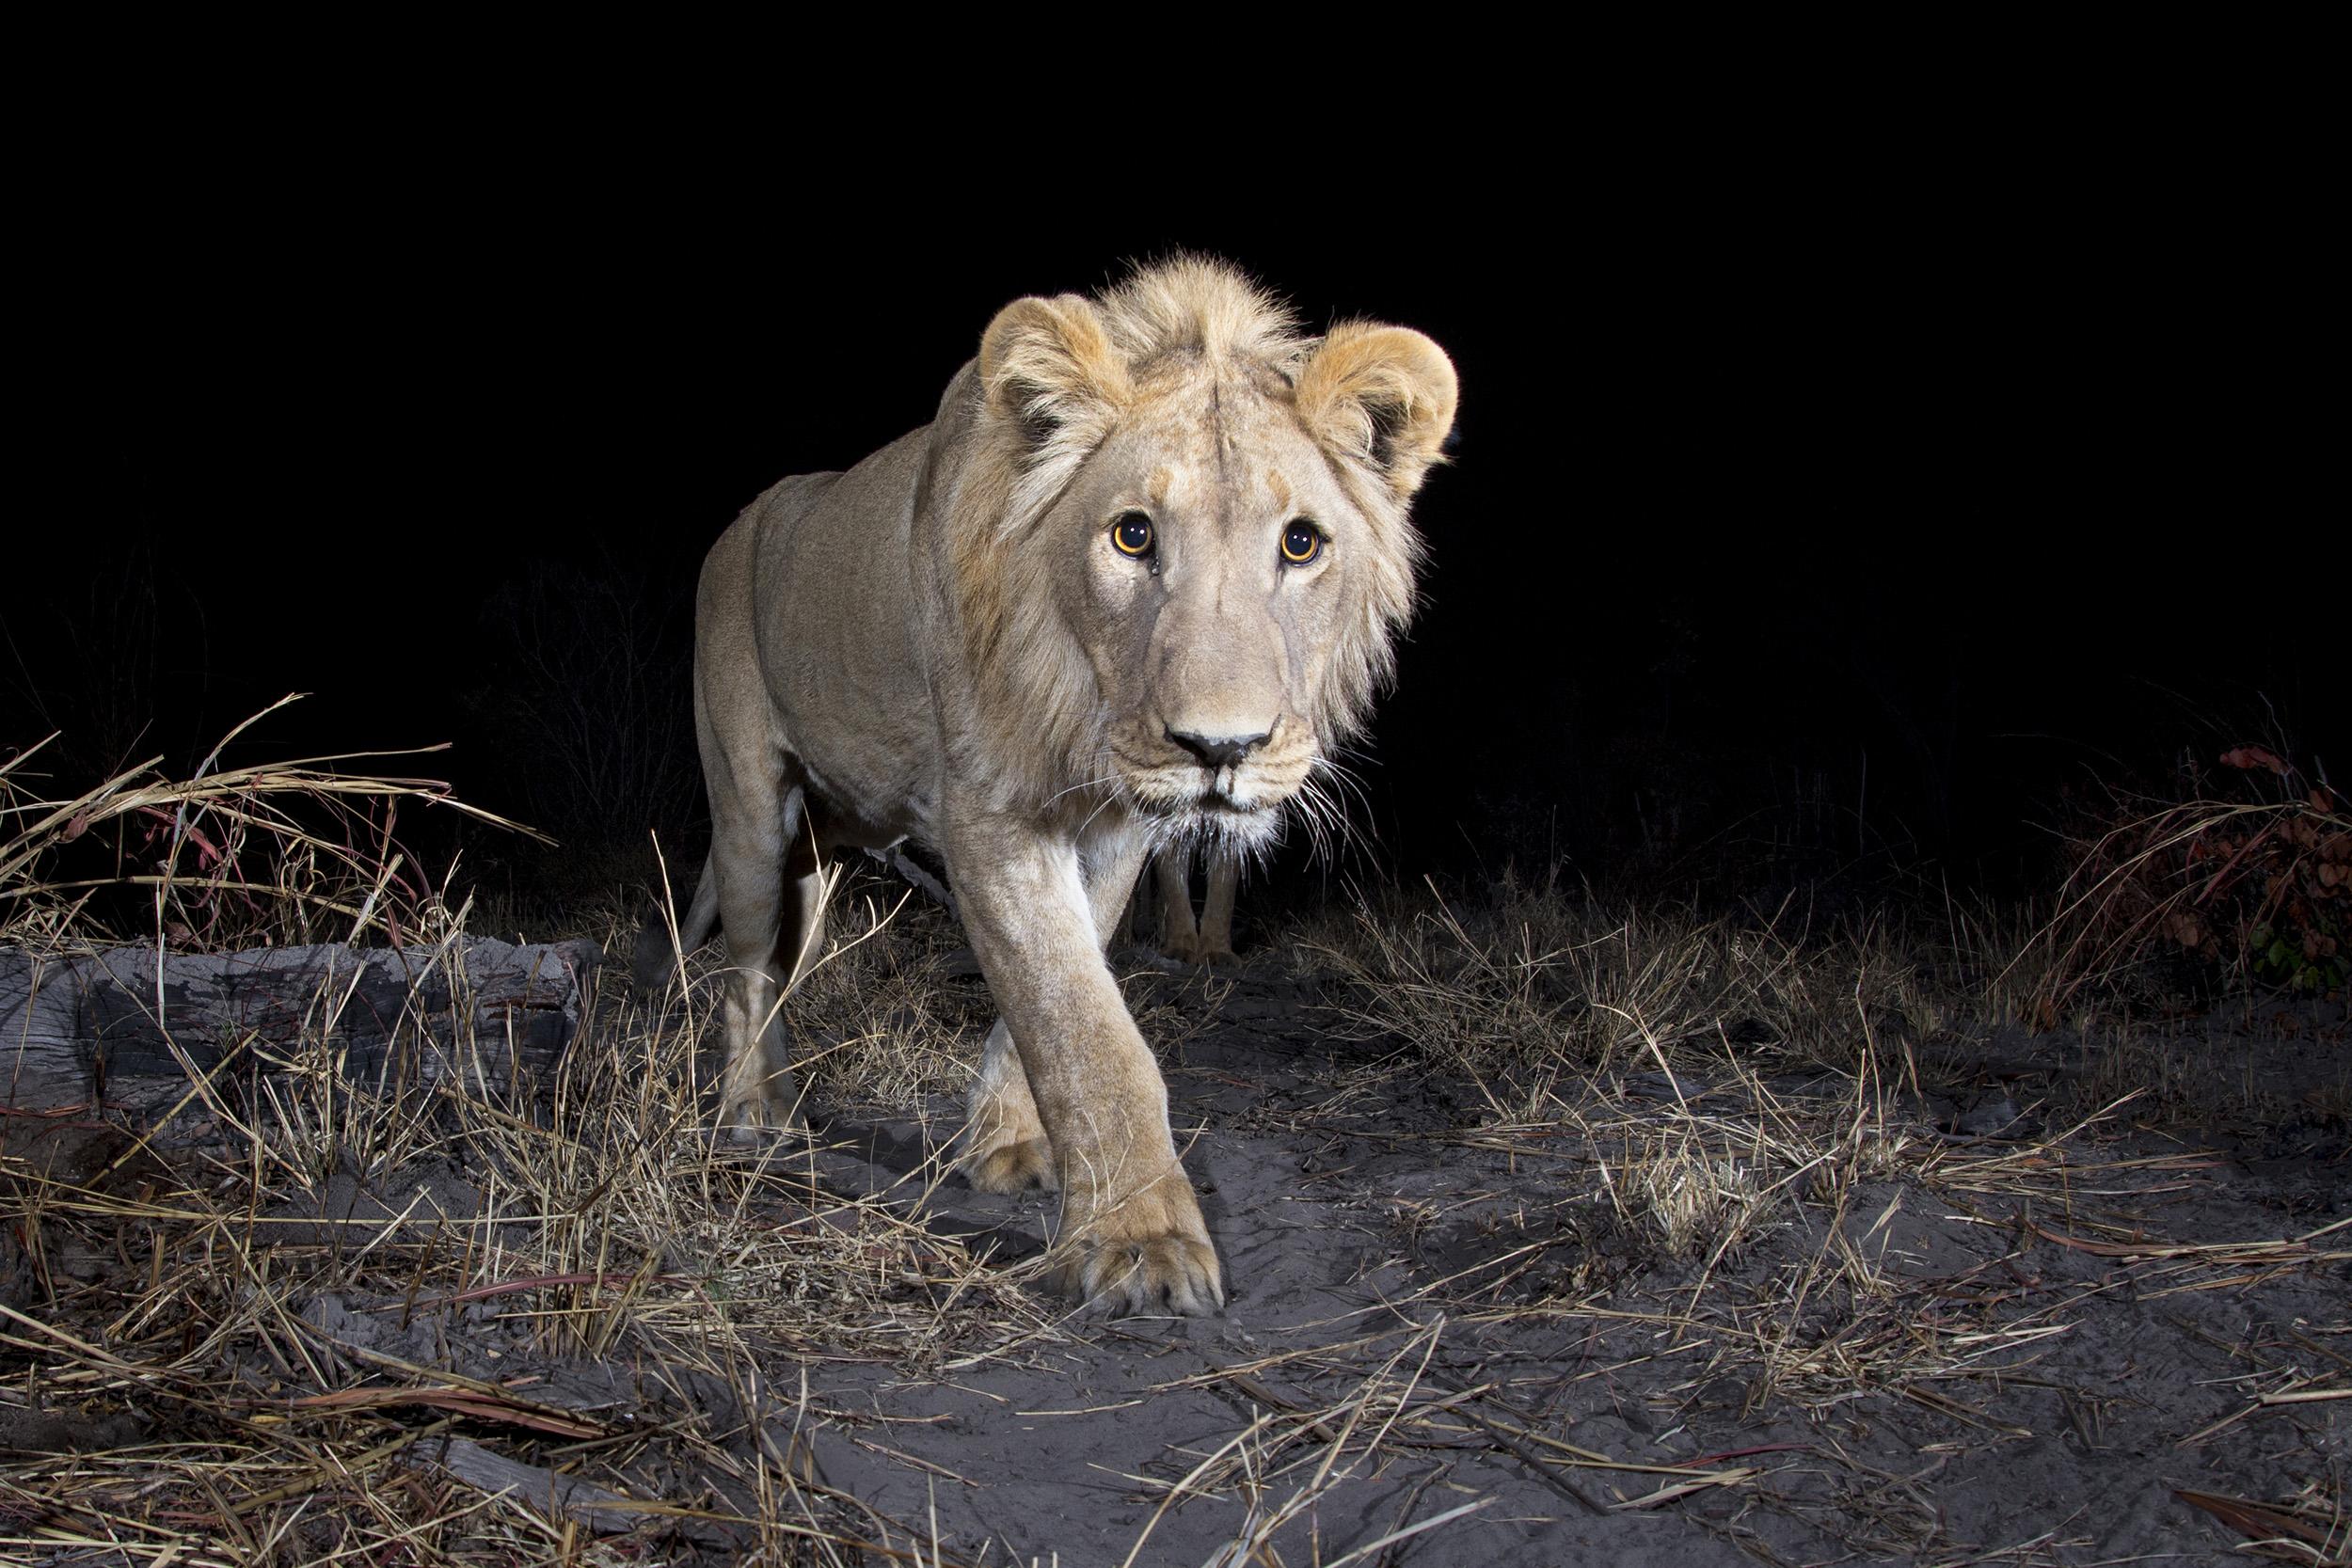 A camera trap image of a lion using Camtraptions PIR motion sensor.